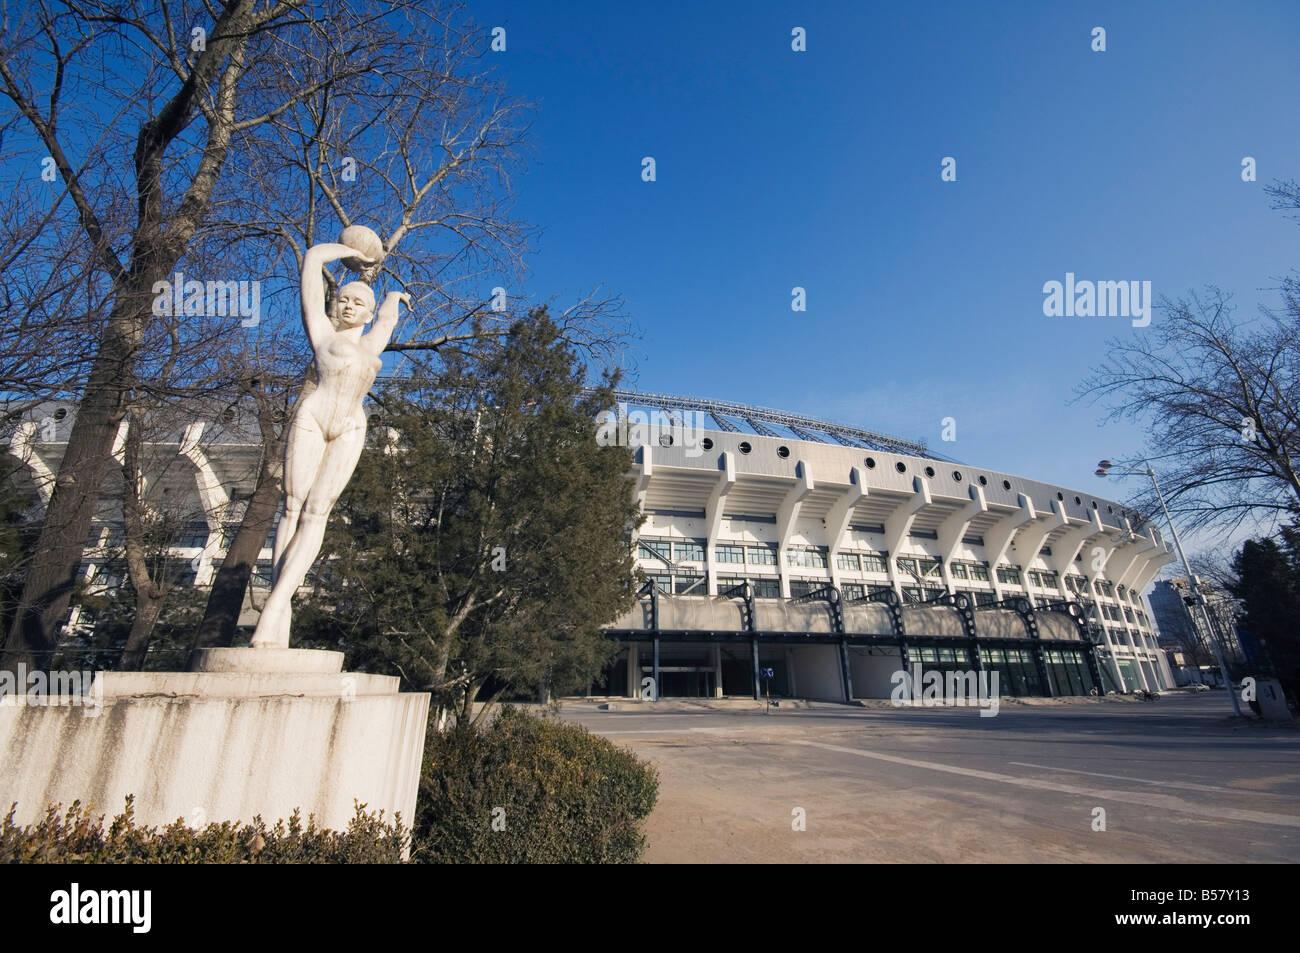 Workers Stadium Olympic venue, Sanlitun, Beijing, China, Asia - Stock Image